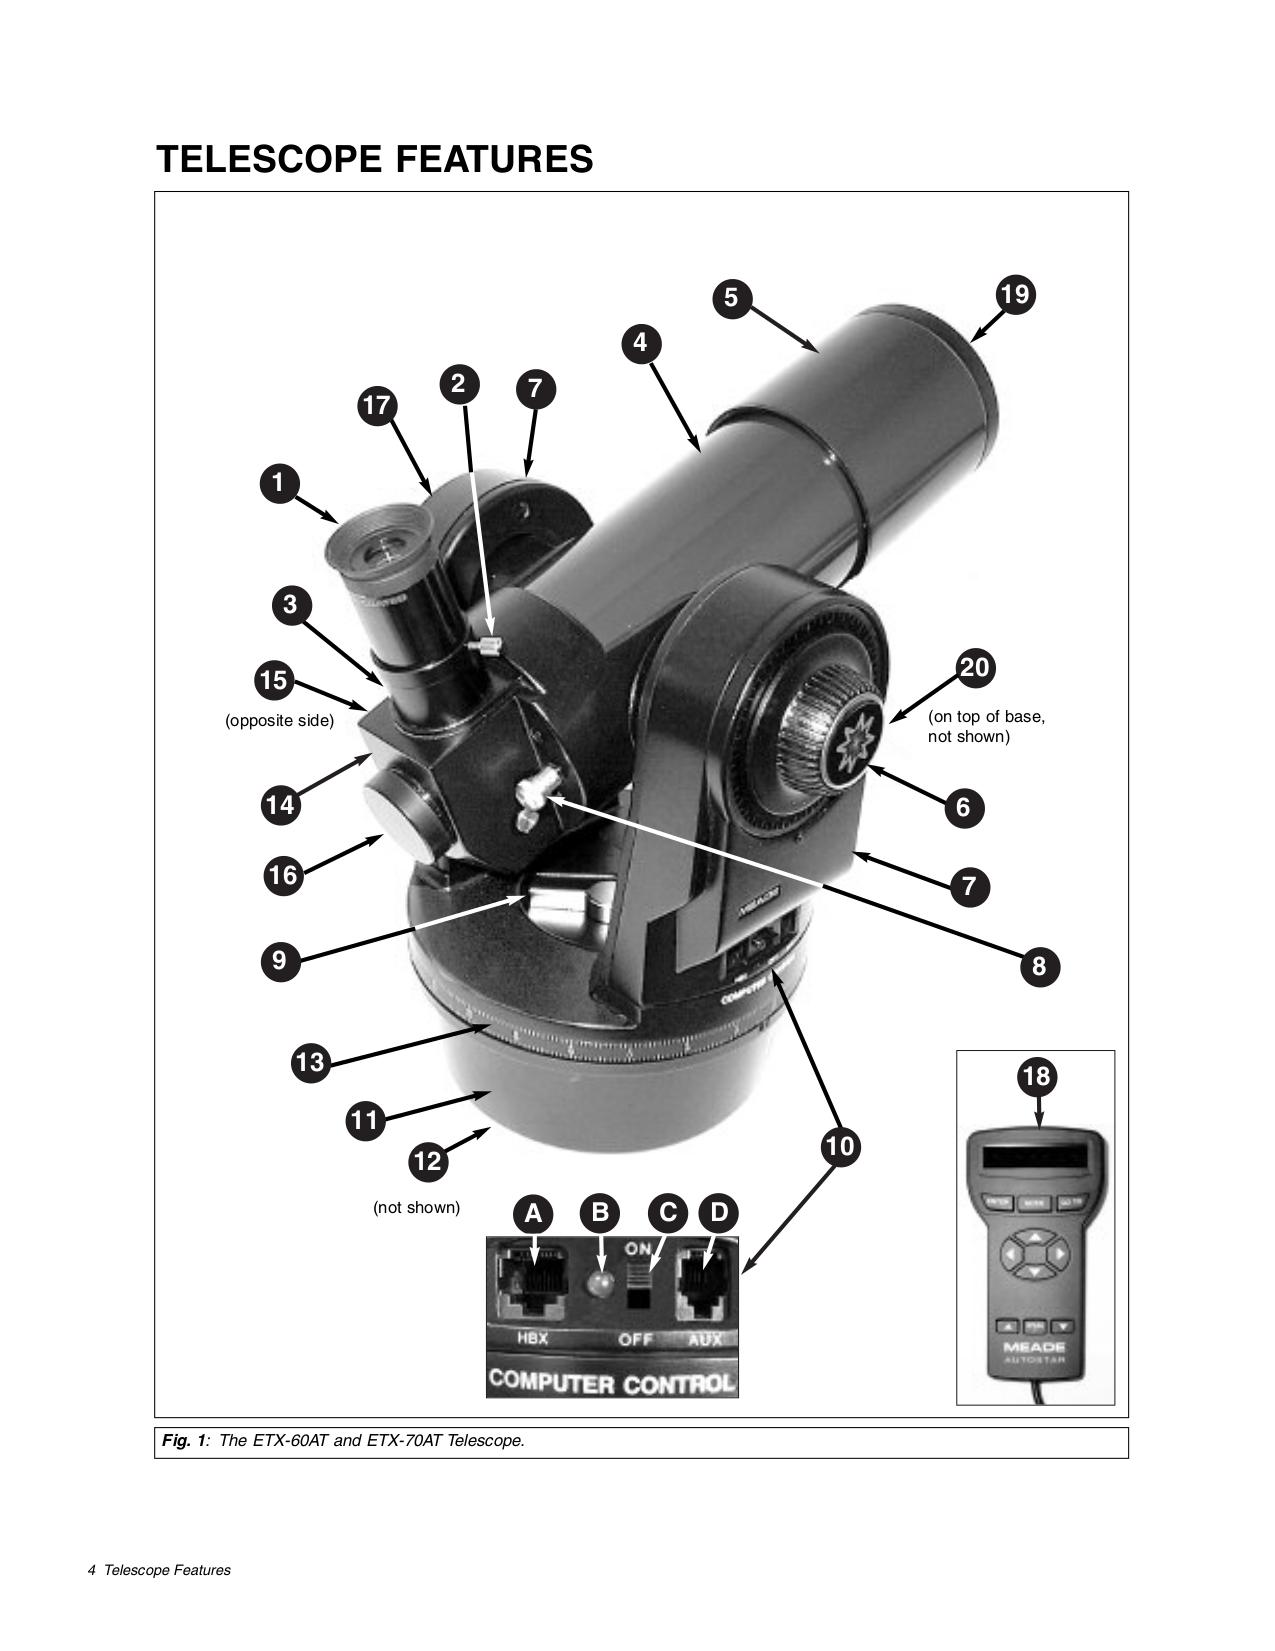 Meade etx-90 observer 90mm f/13. 8 maksutov-cassegrain telescope.